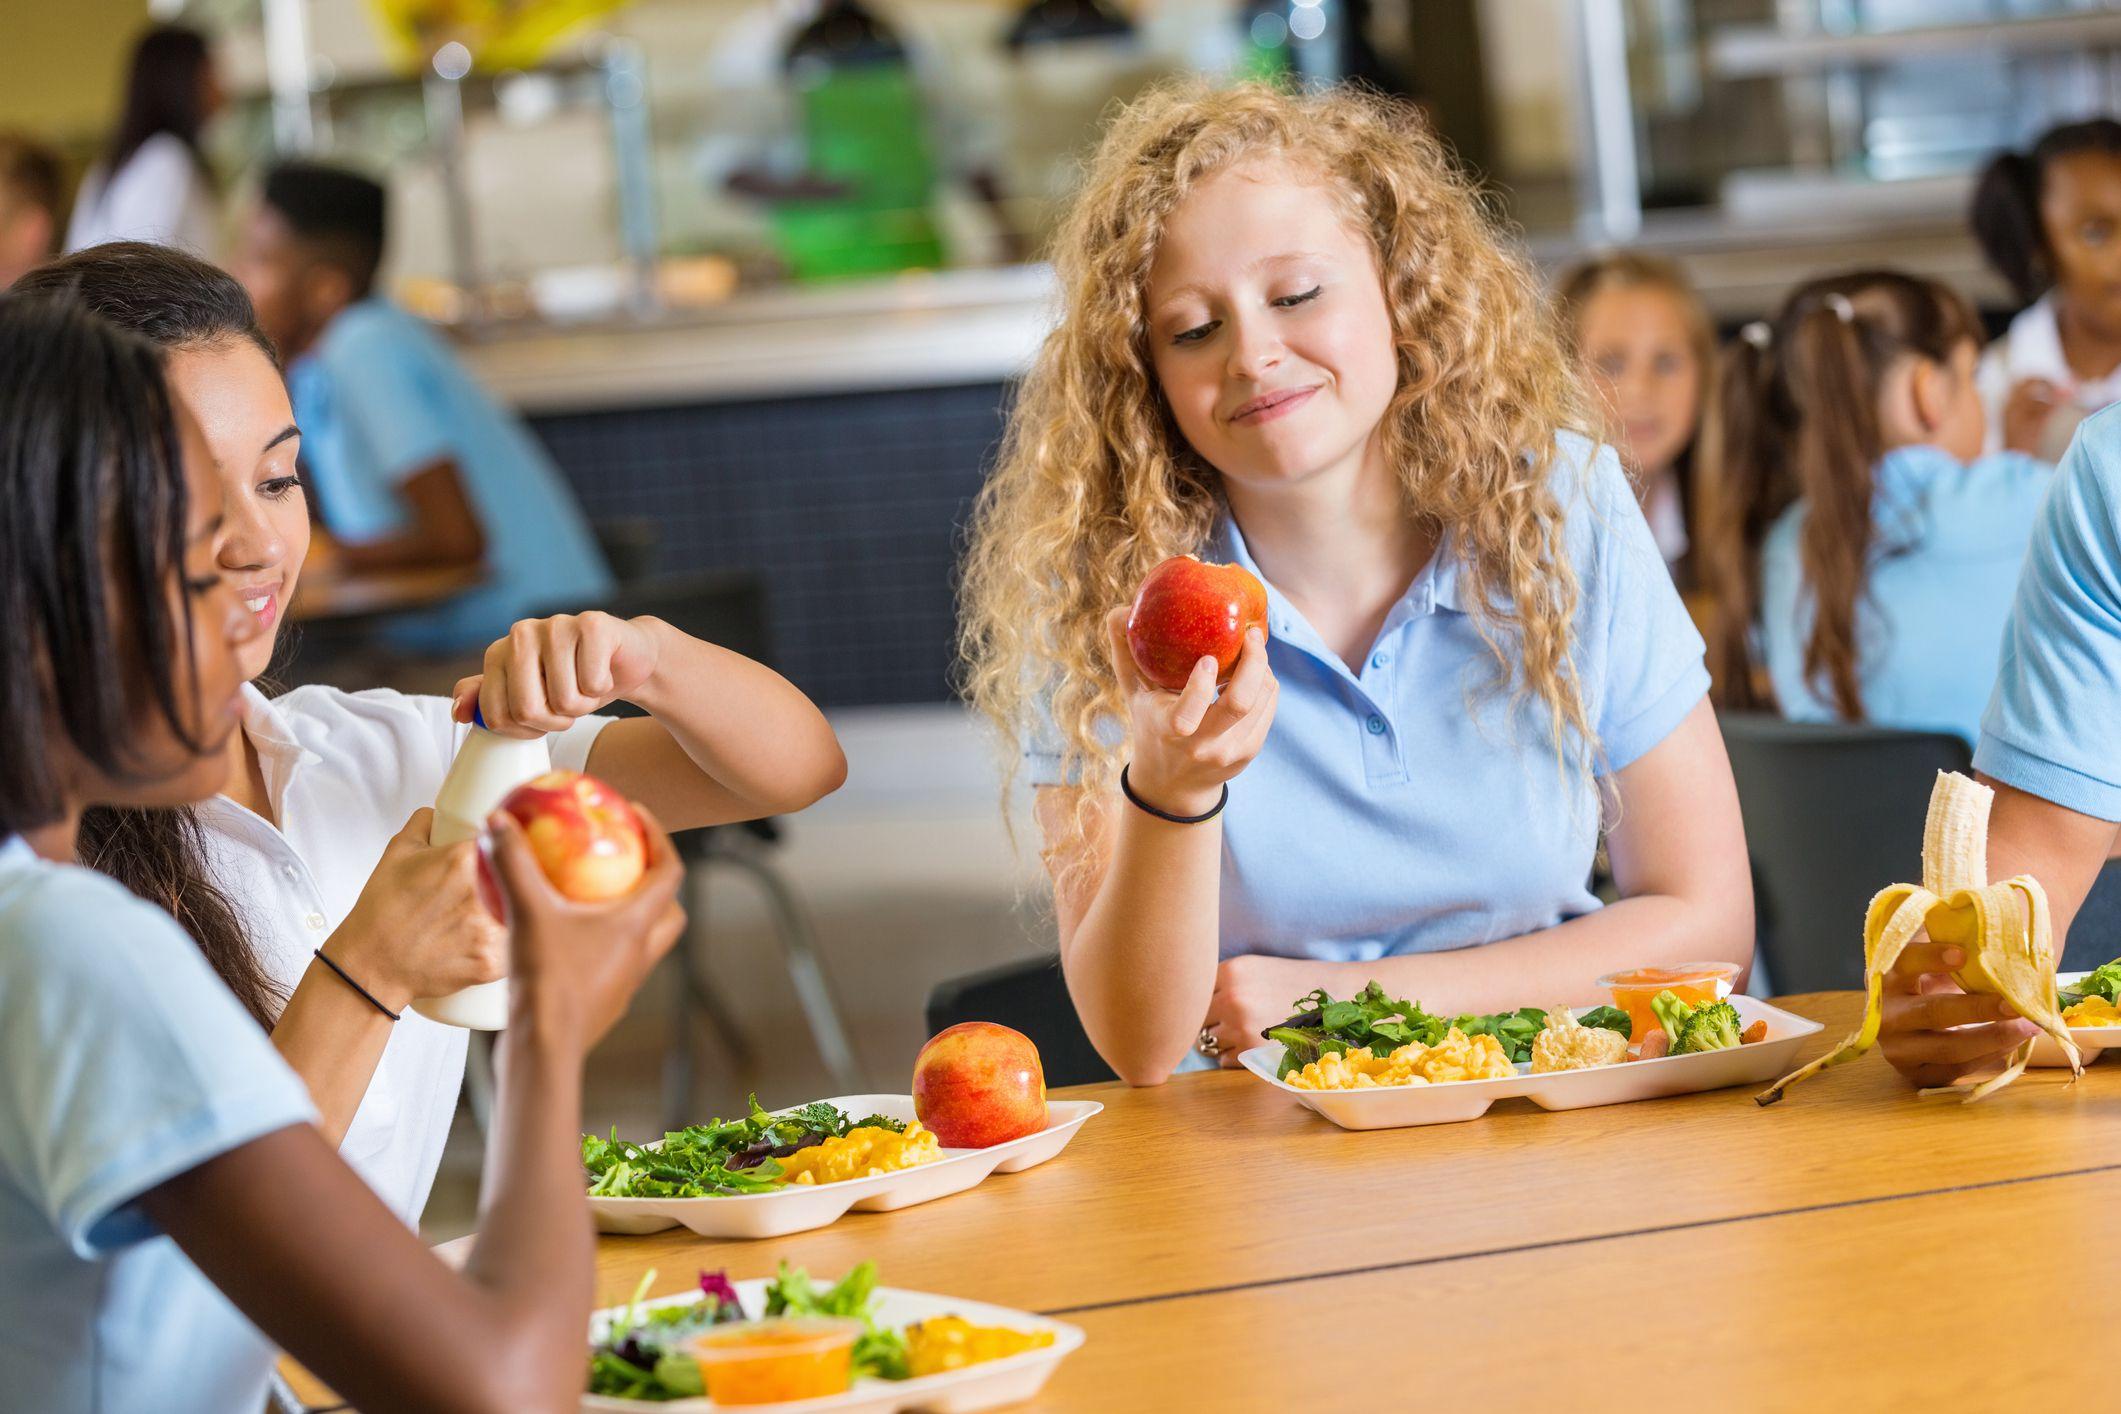 Nutrition on Teenagers